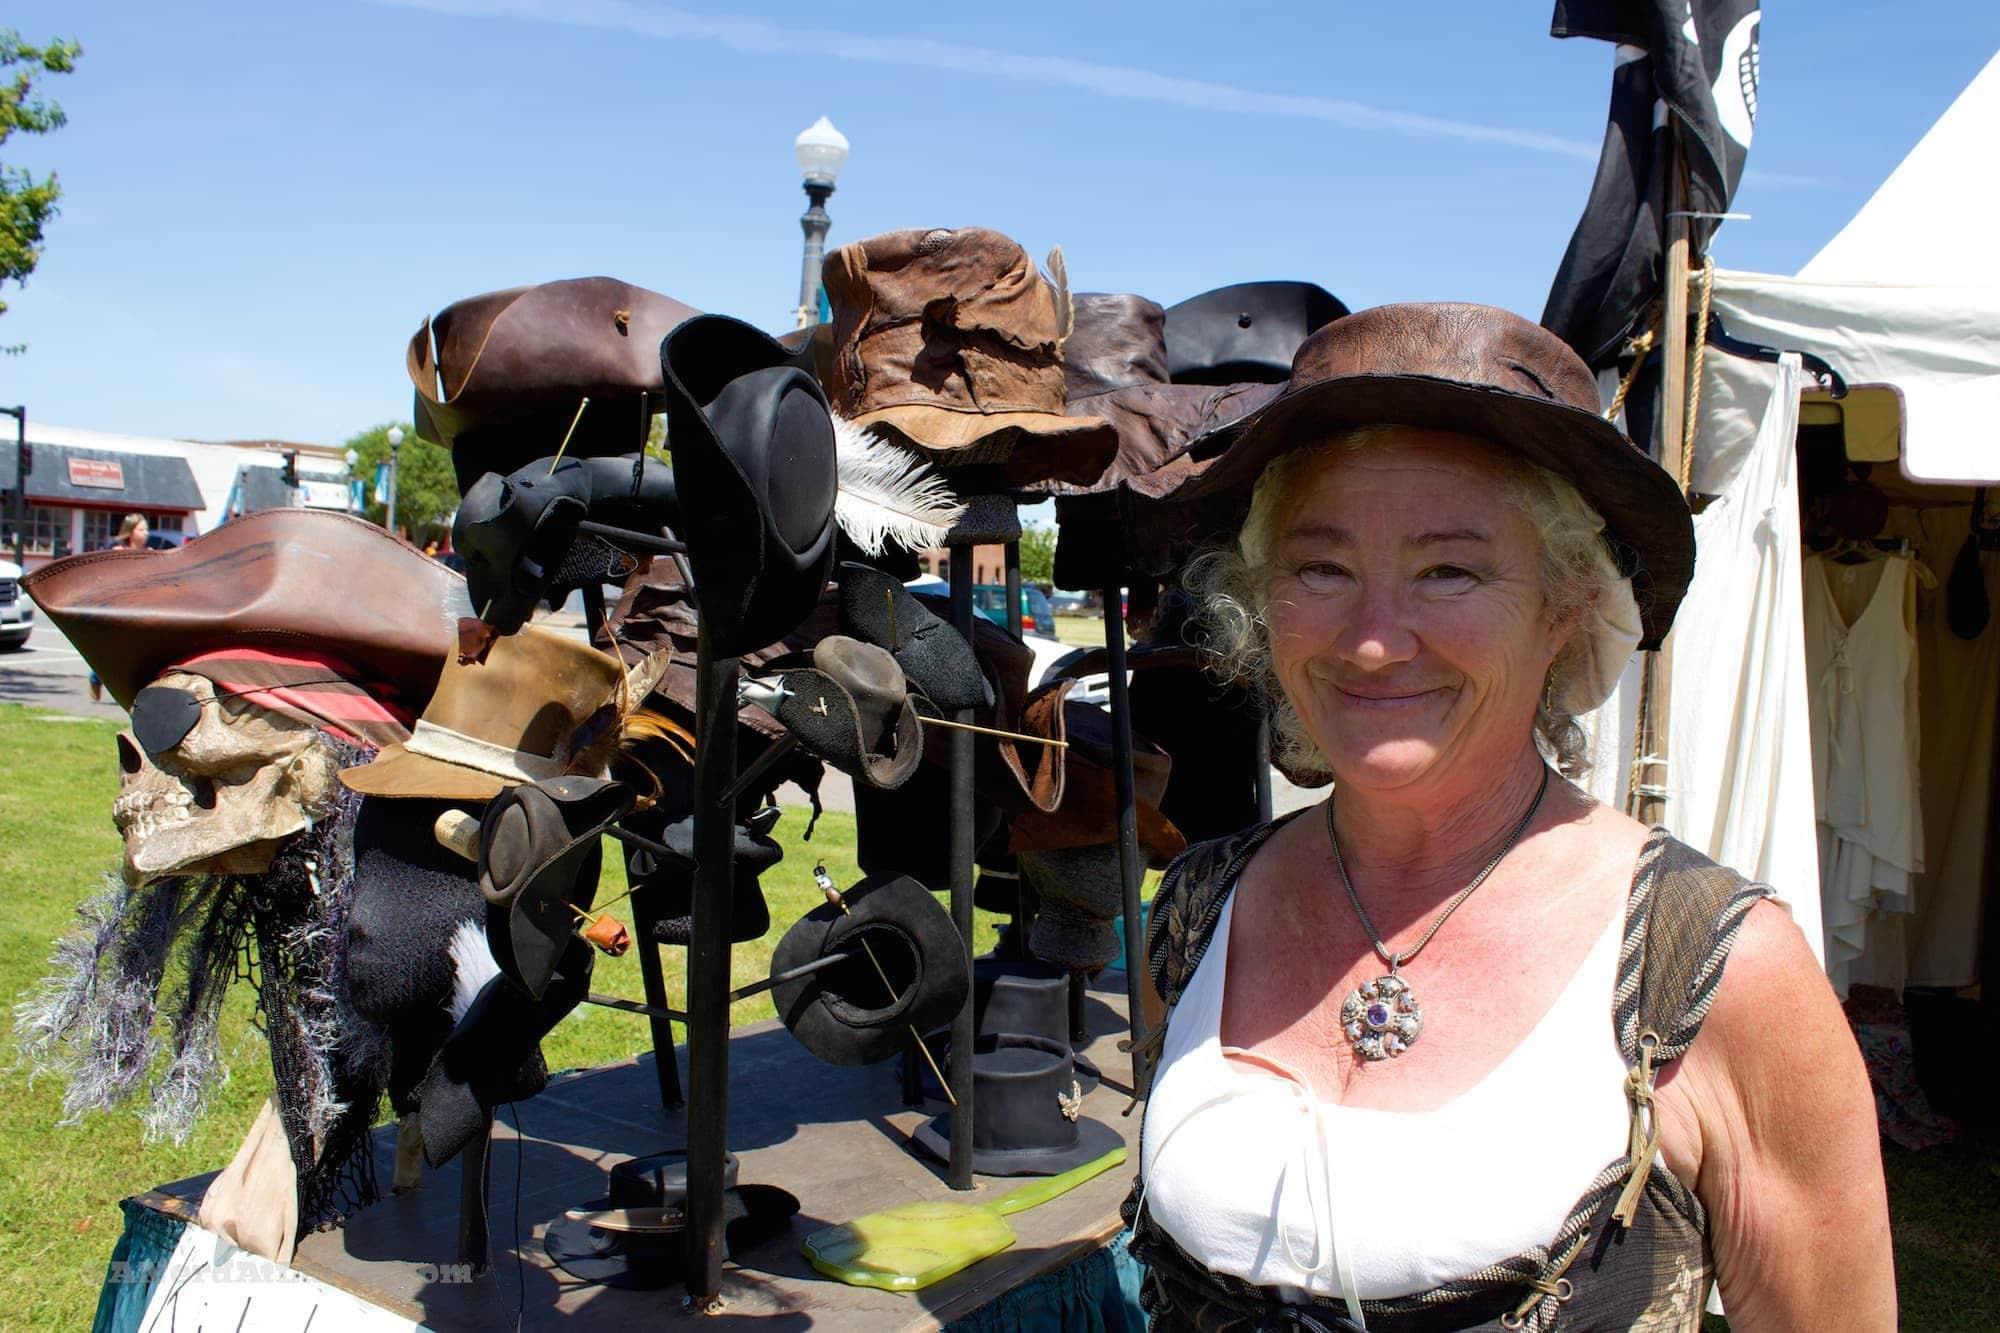 Blackbeard hatmaker